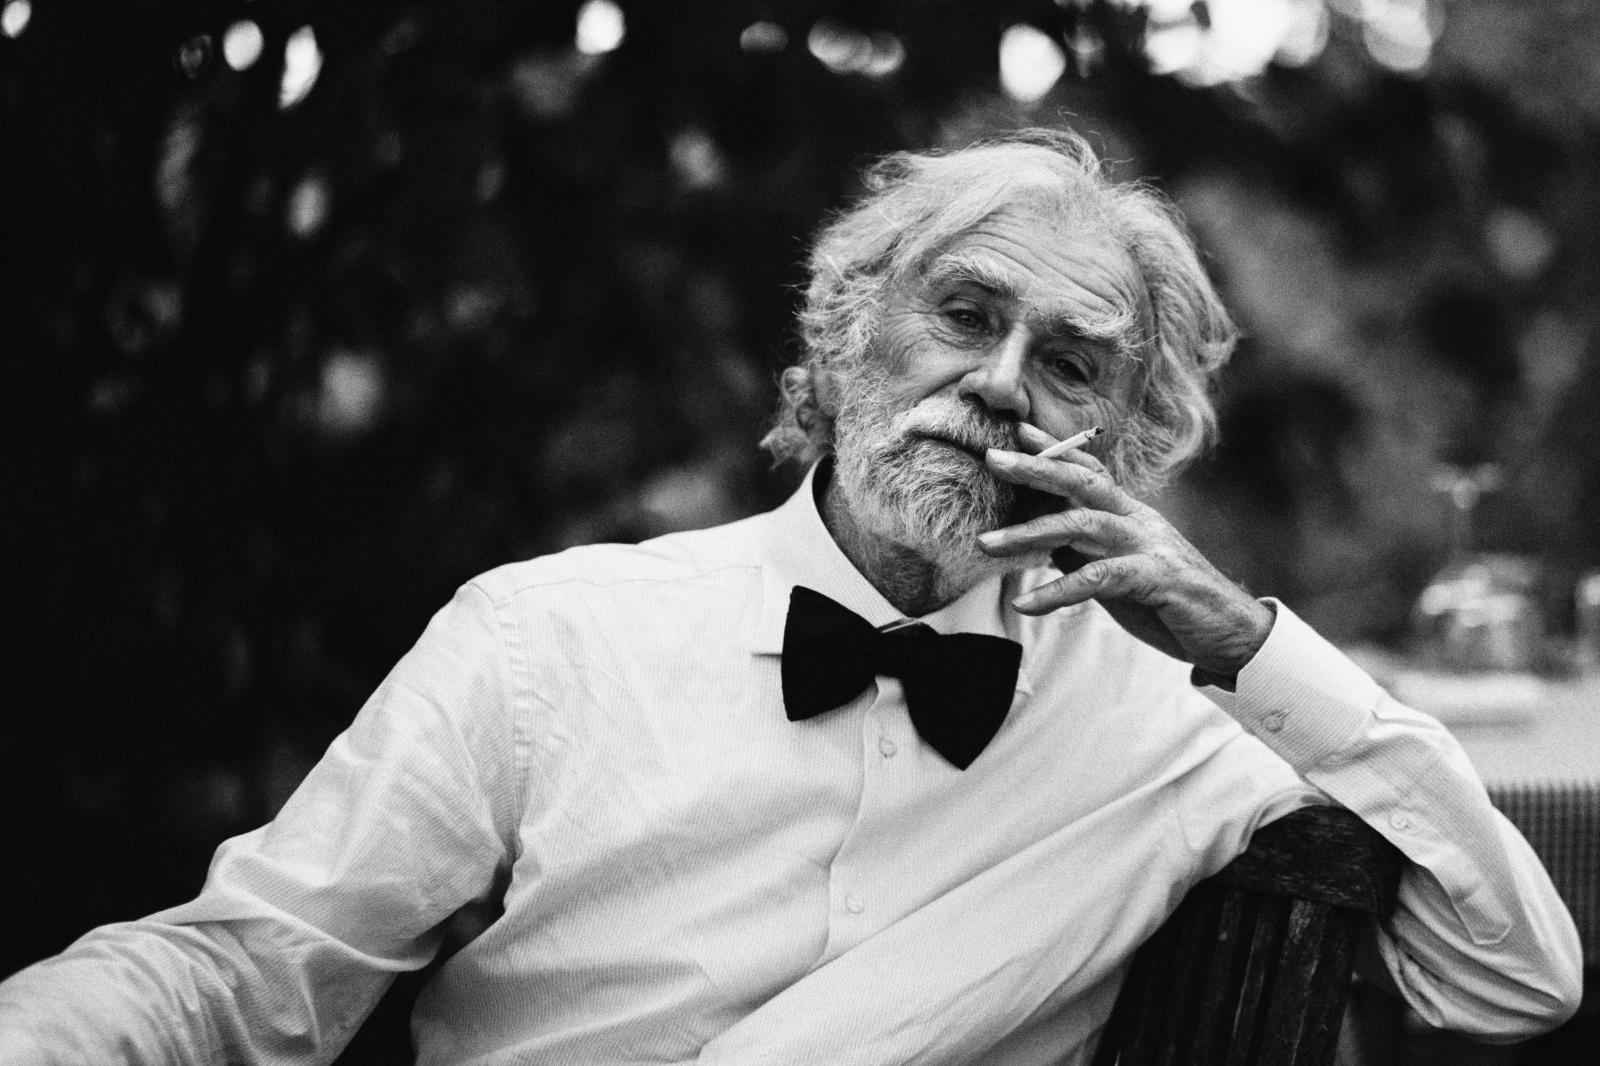 Black monochrome portrait photography smoking gentleman person man human oldman photograph cigarette black and white monochrome